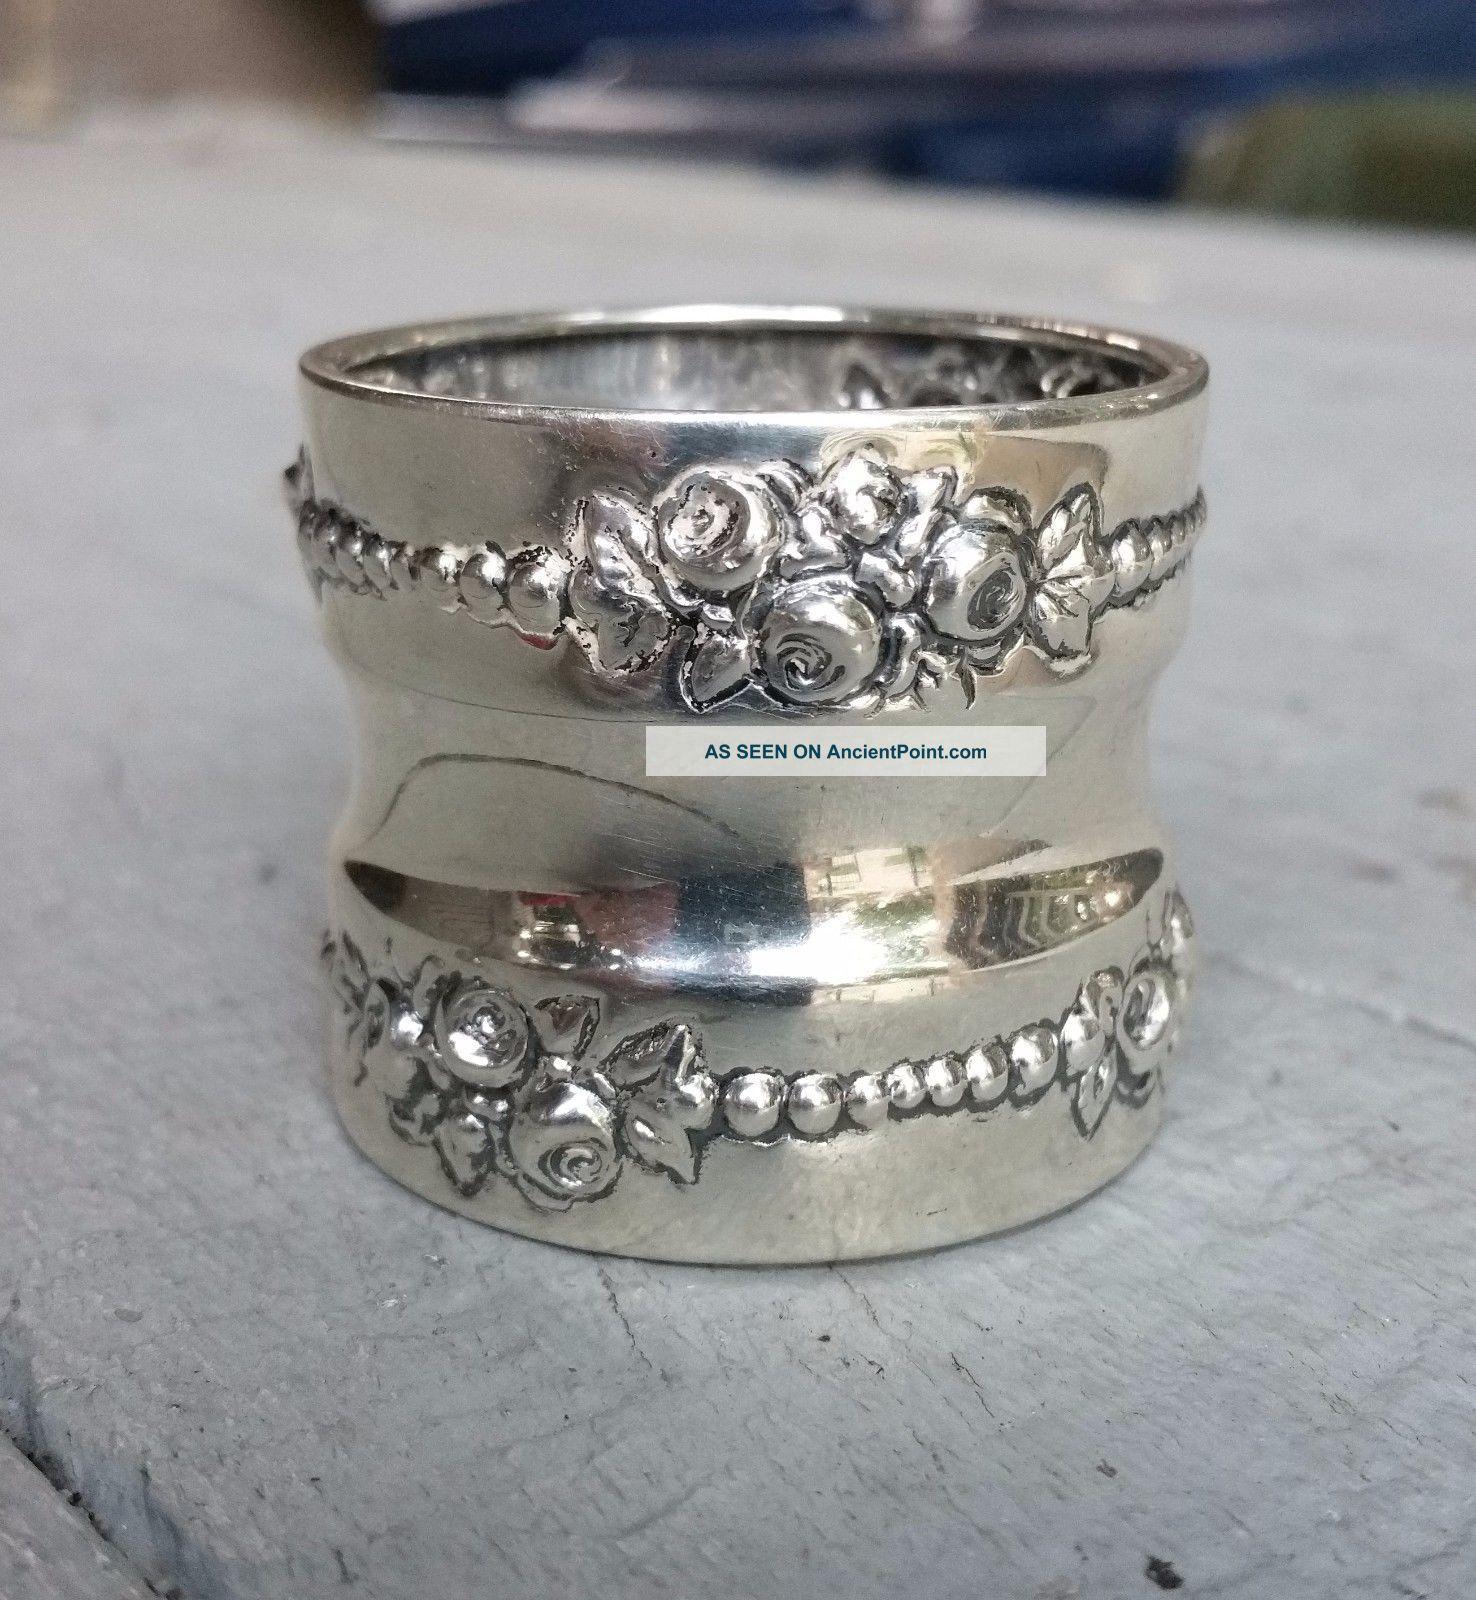 Lancaster By Gorham Sterling Silver Napkin Ring No Monogram Napkin Rings & Clips photo